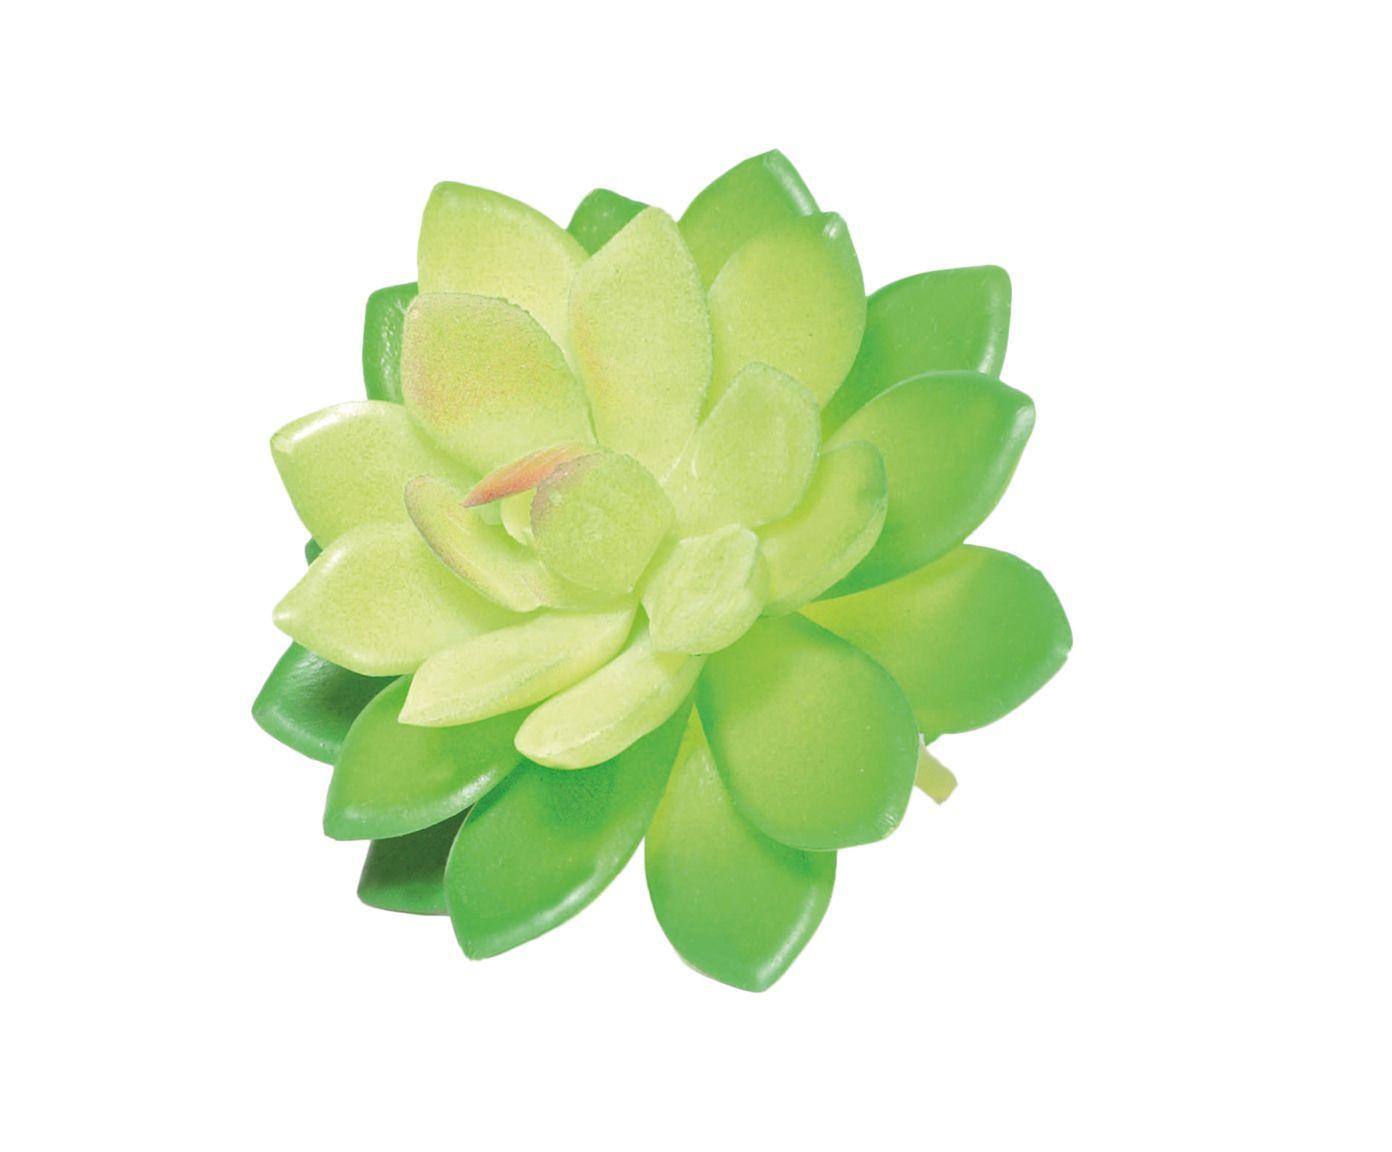 Planta Permanente Suculenta Cuynt - 10X8cm | Westwing.com.br